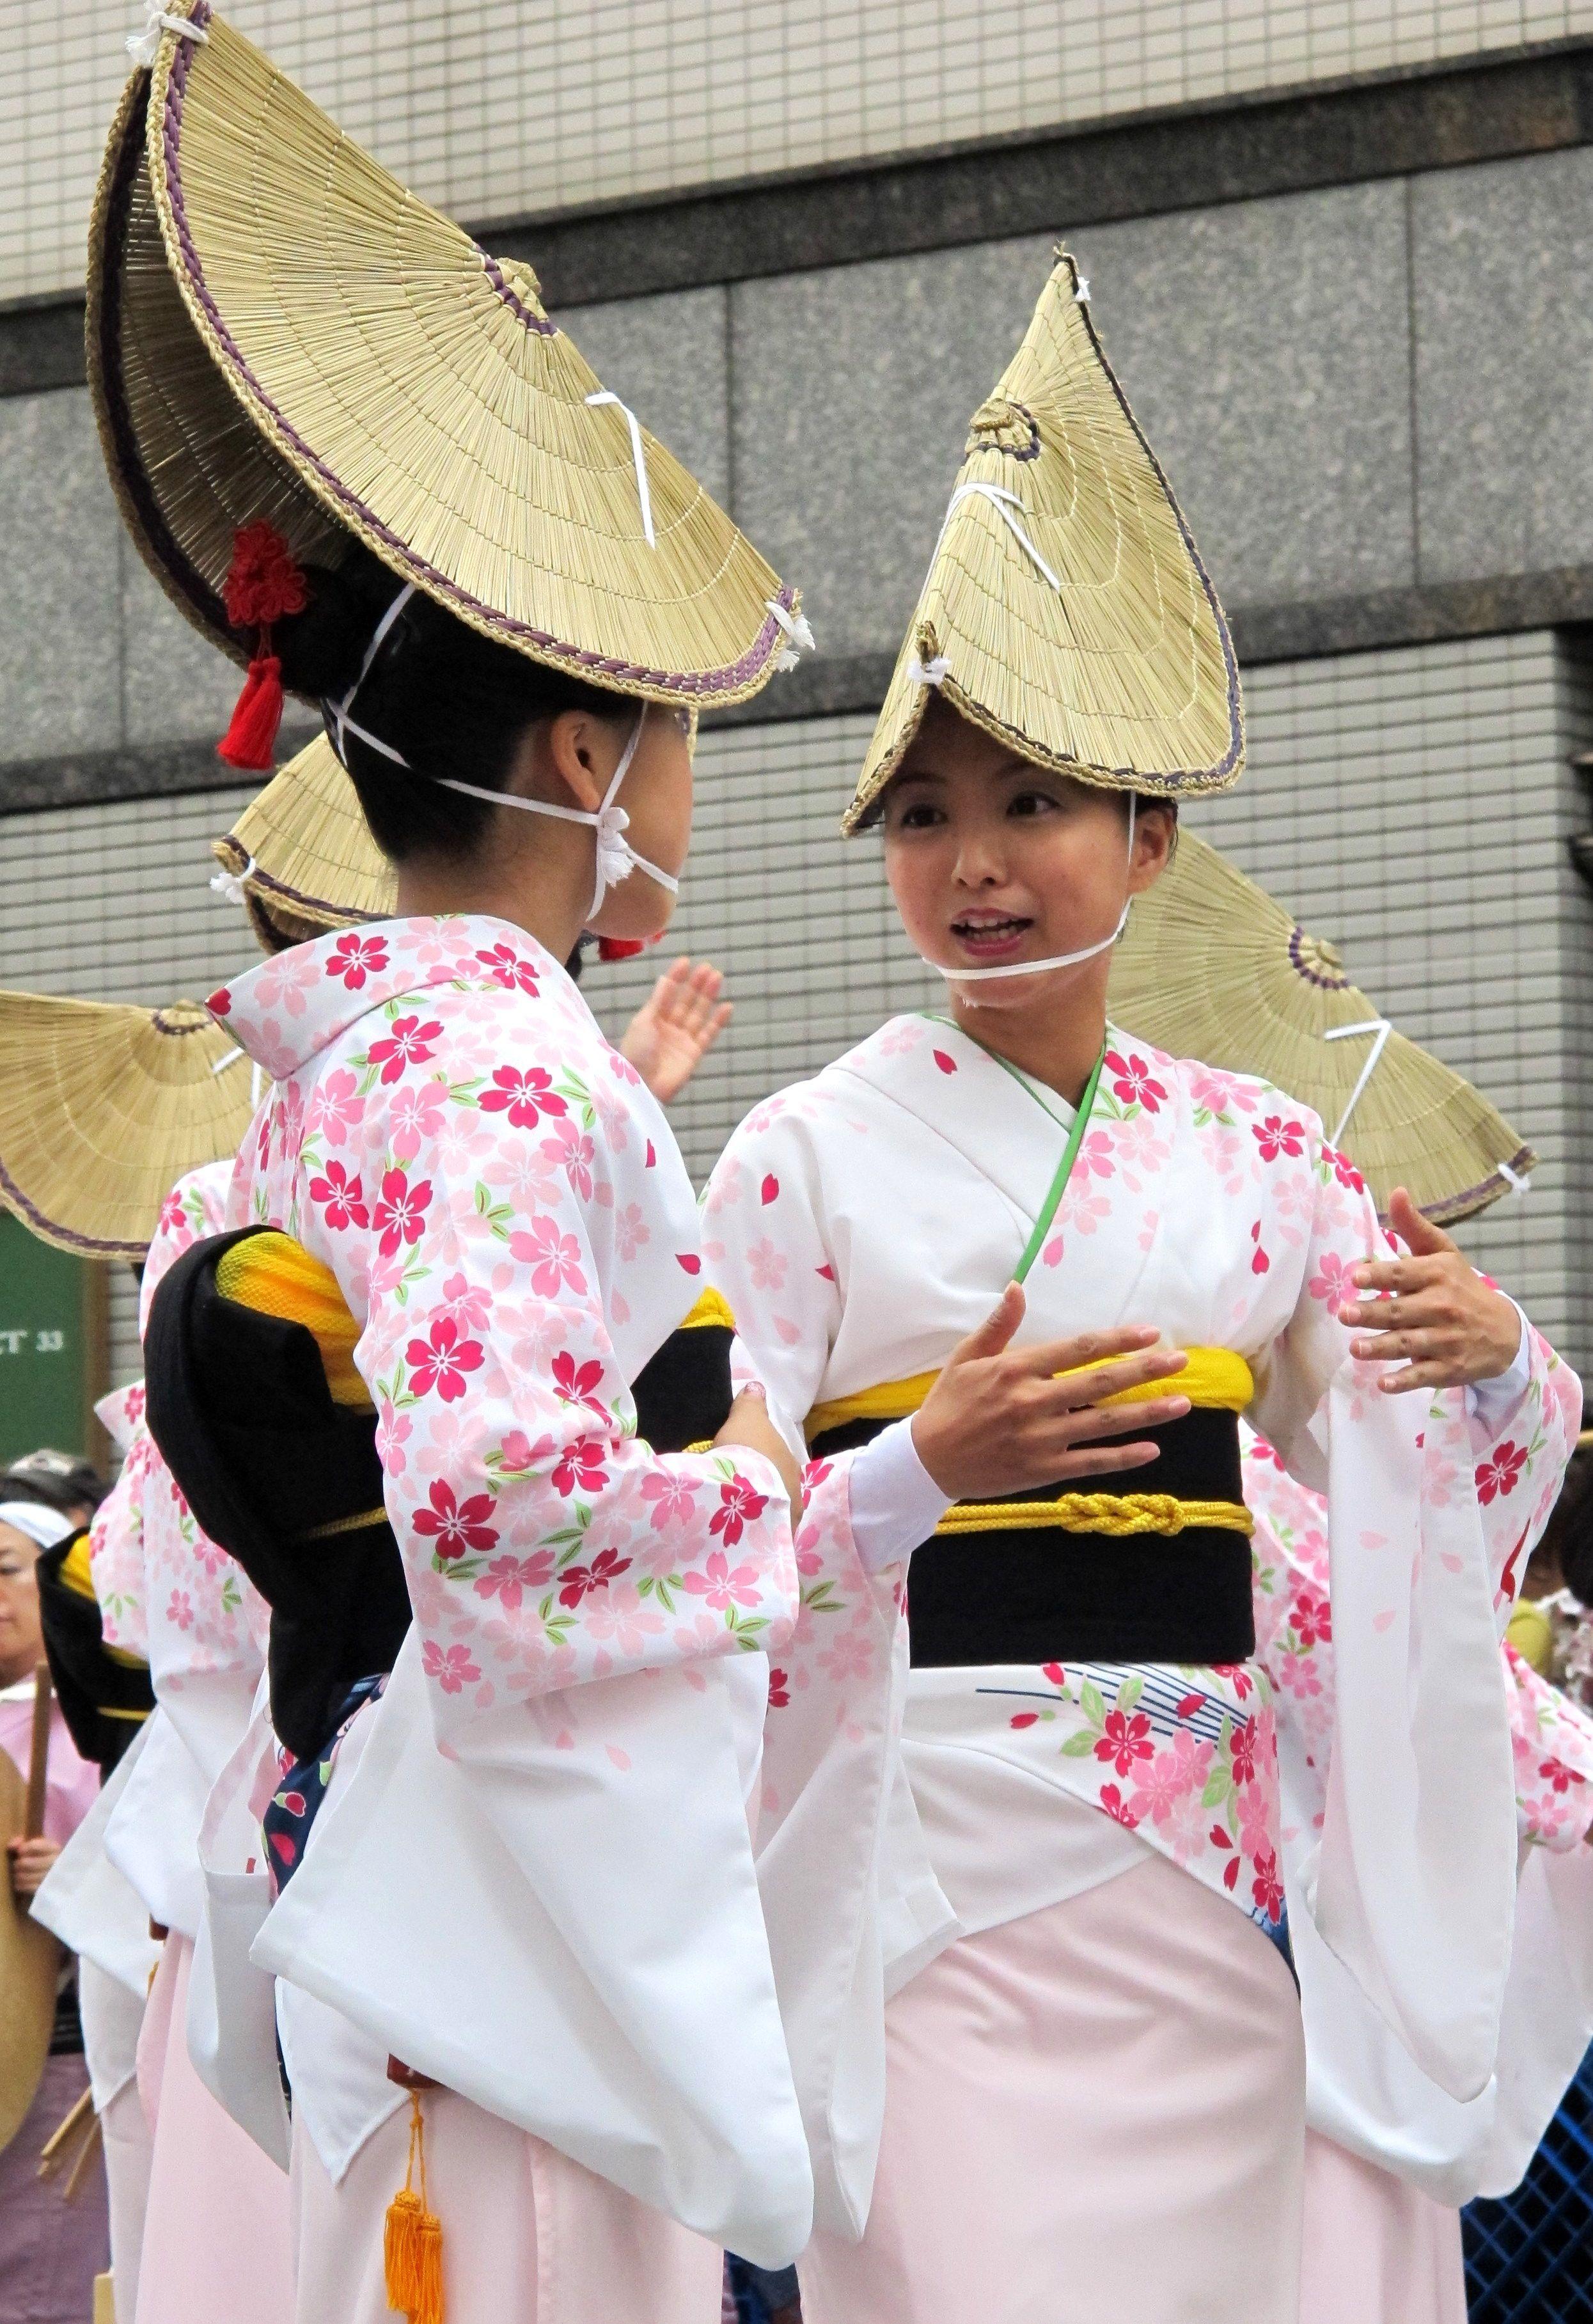 Semi-circular hats, Koenji Awa Odori Festival, Tokyo, Japan